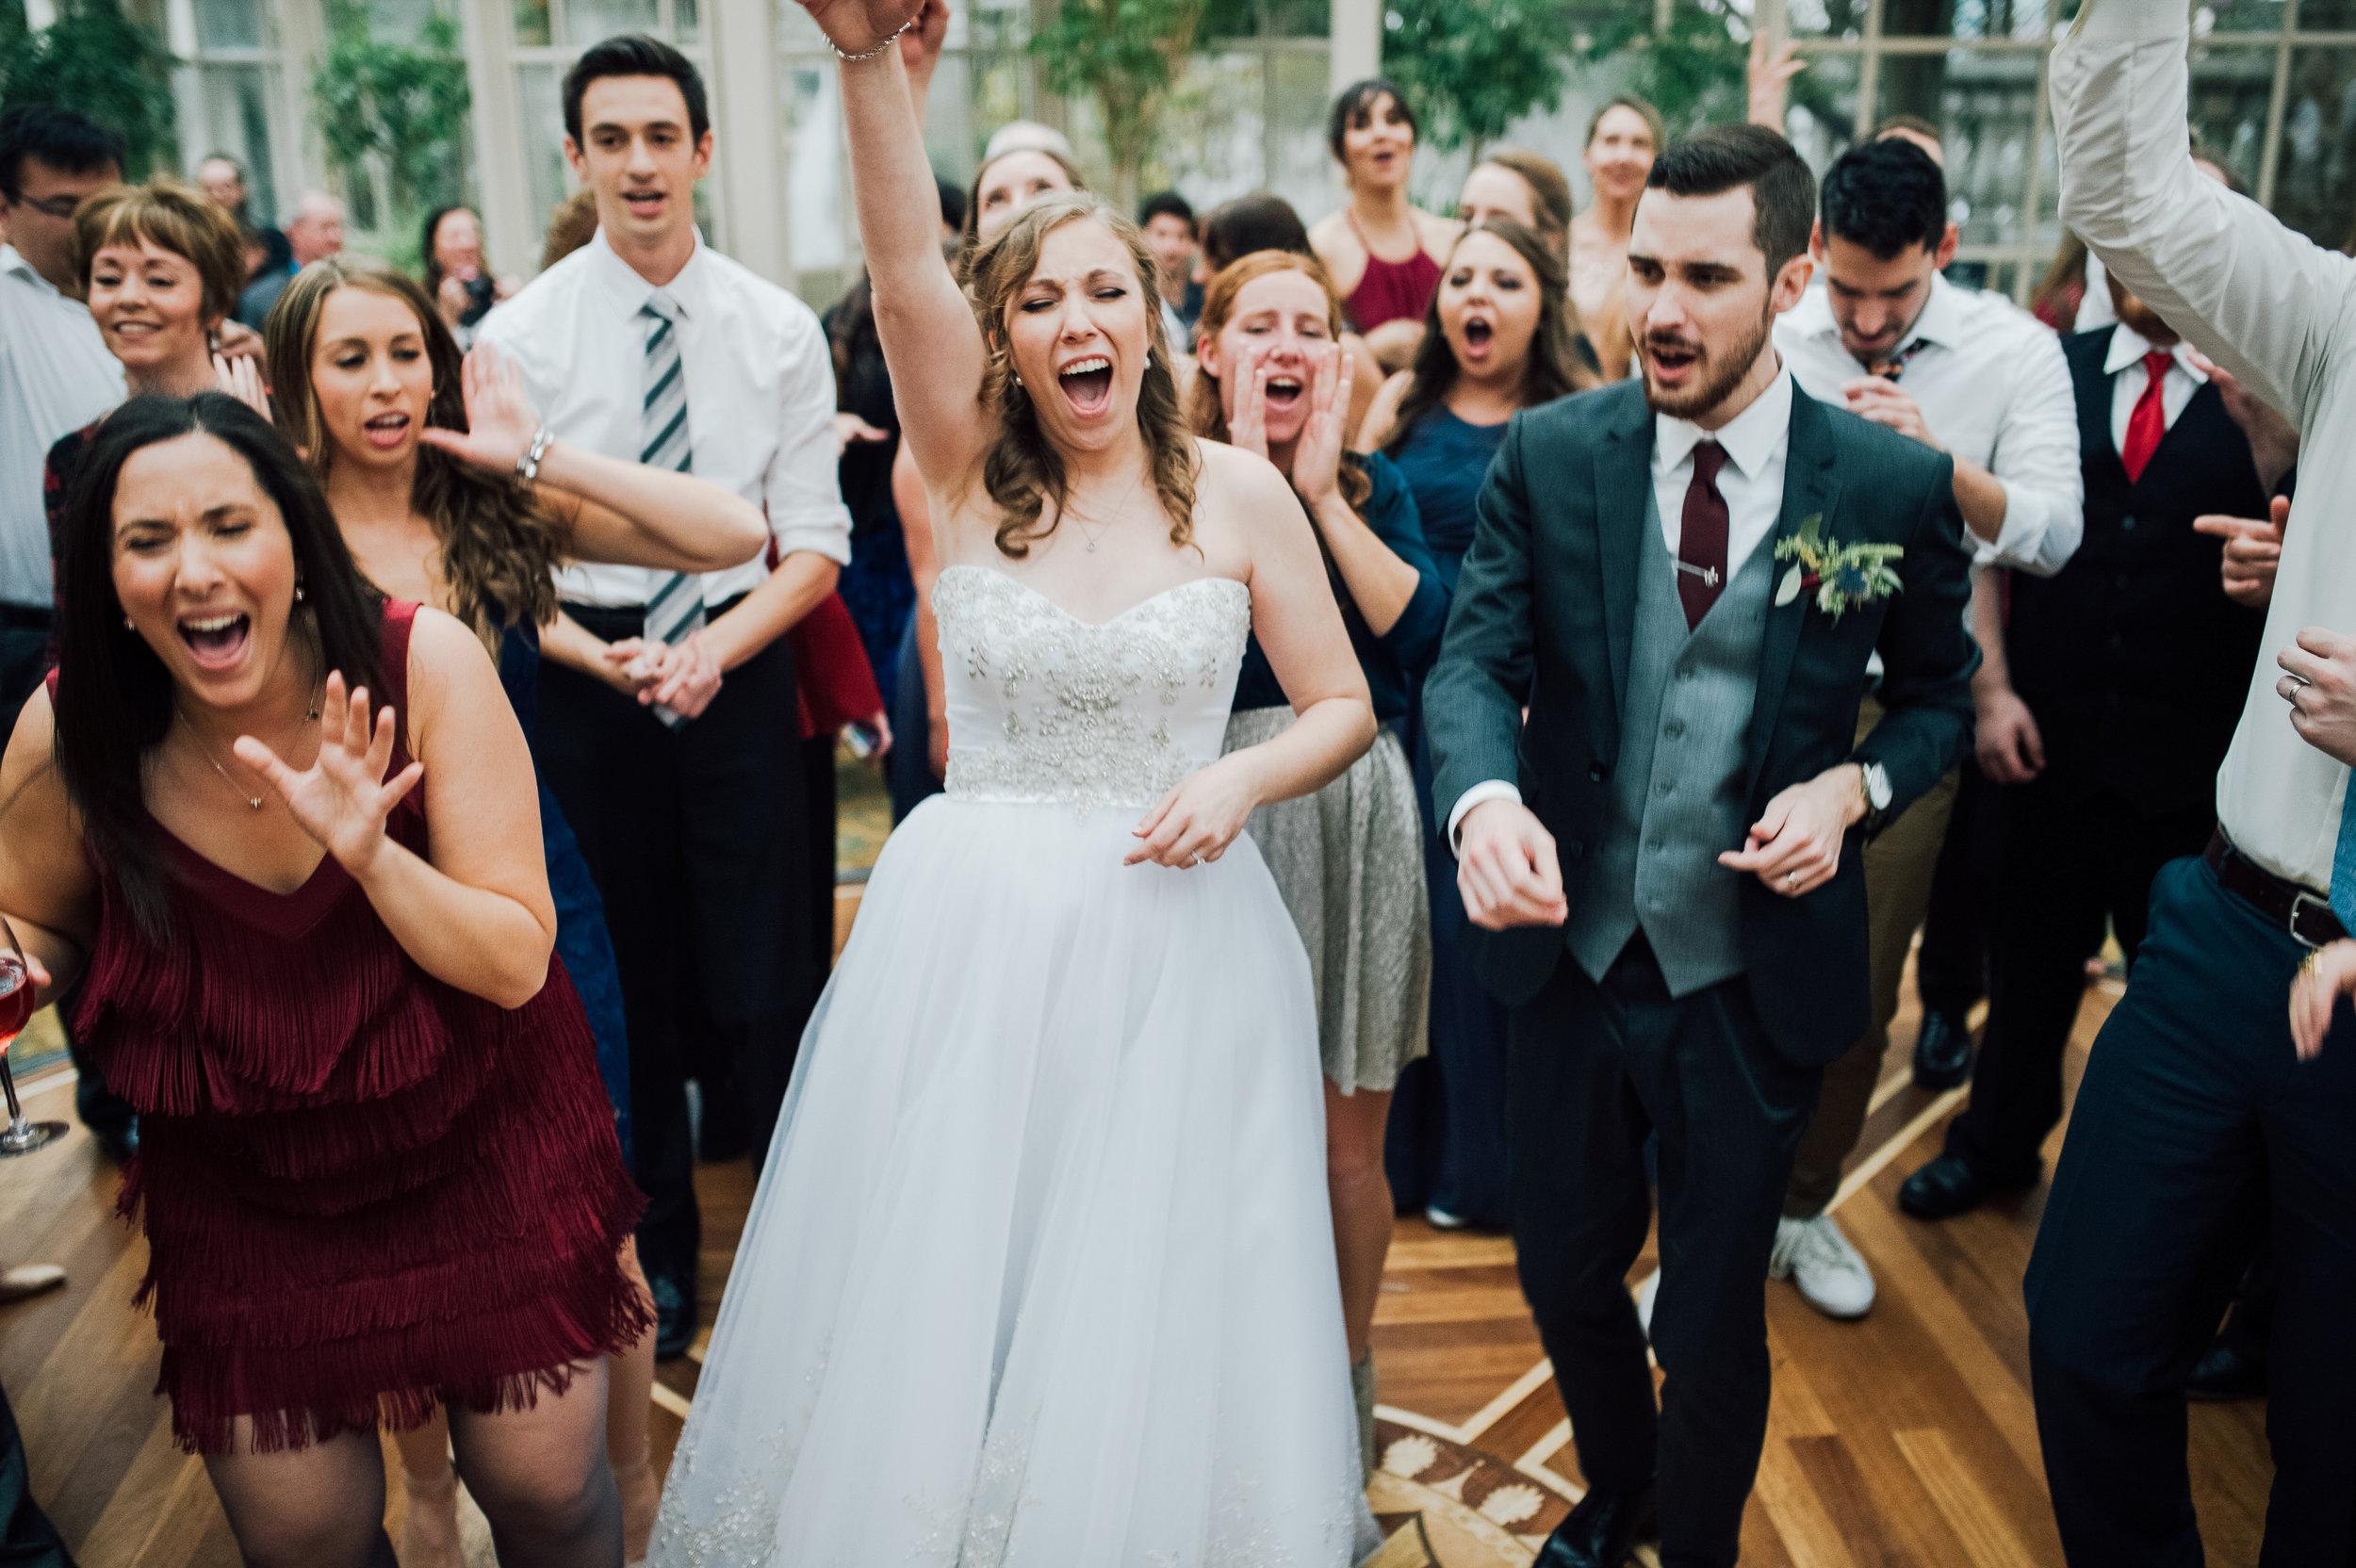 Wedding photography ideas by popular New York Wedding Photographer Laurel Creative